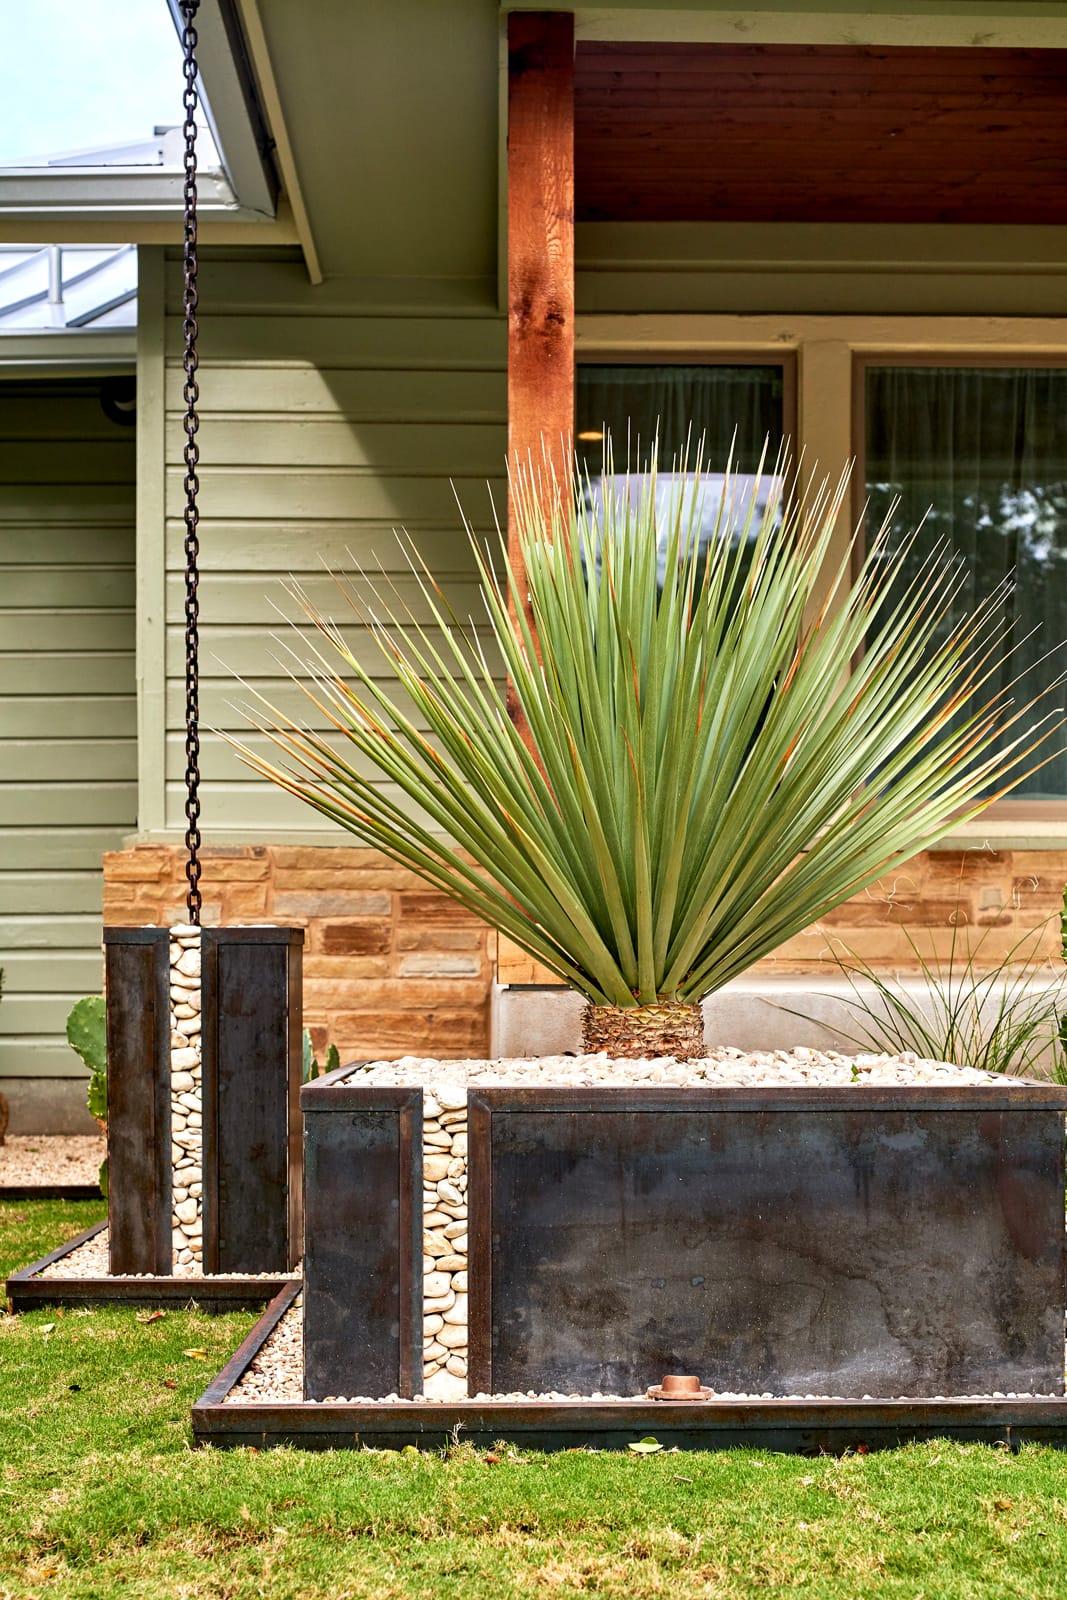 Magazine Avenue landscape design project by LUSH GreenScape Design in New Braunfels, TX